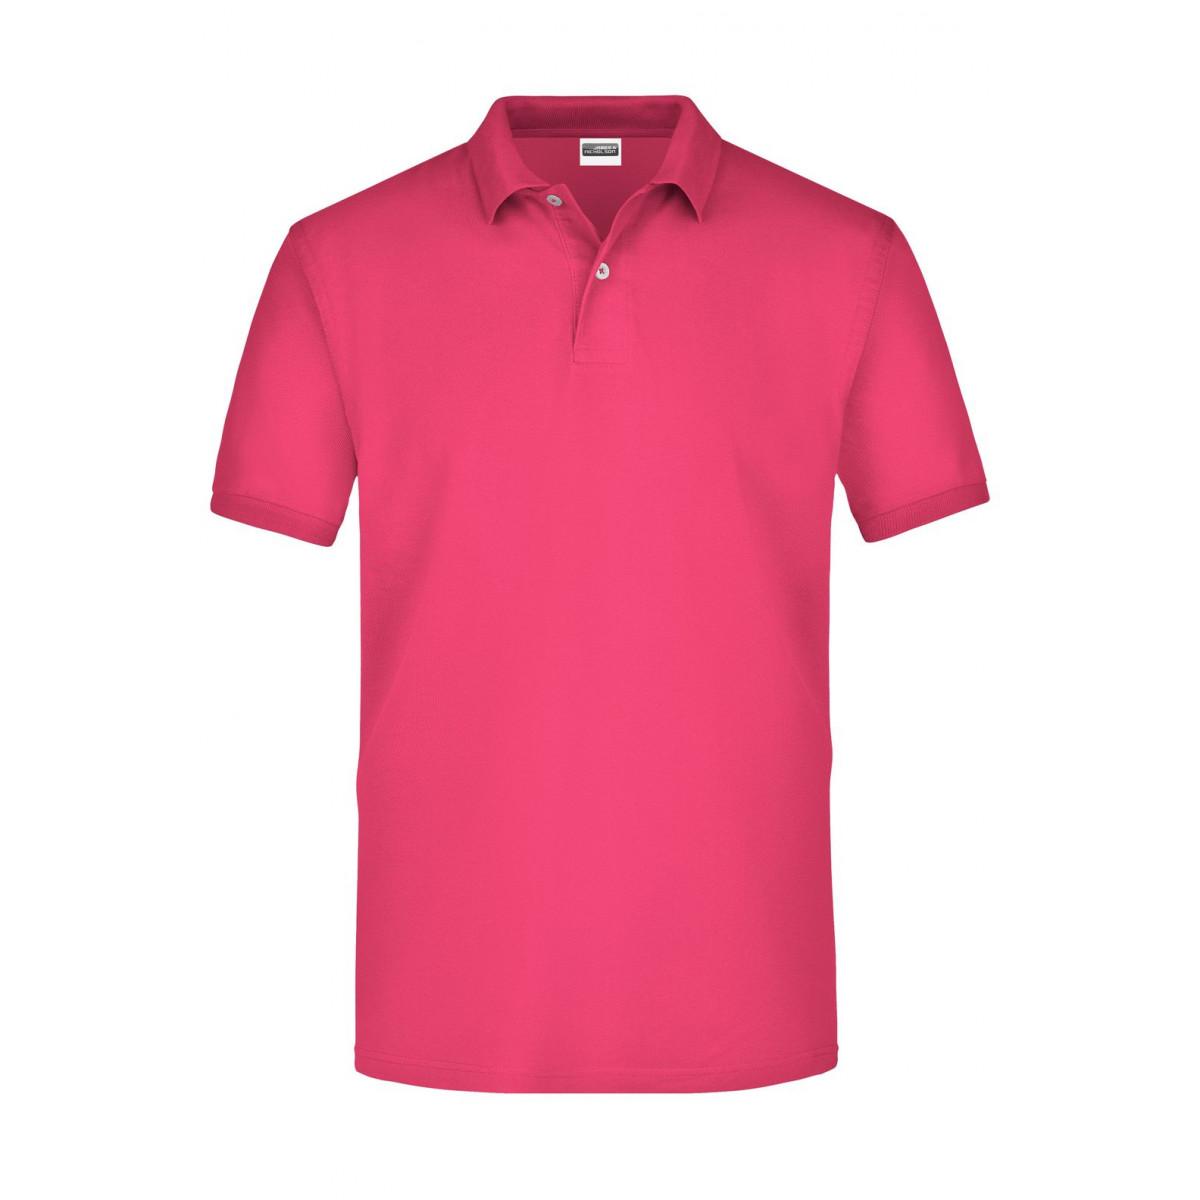 Рубашка поло мужская JN918 Basic Polo - Розовый